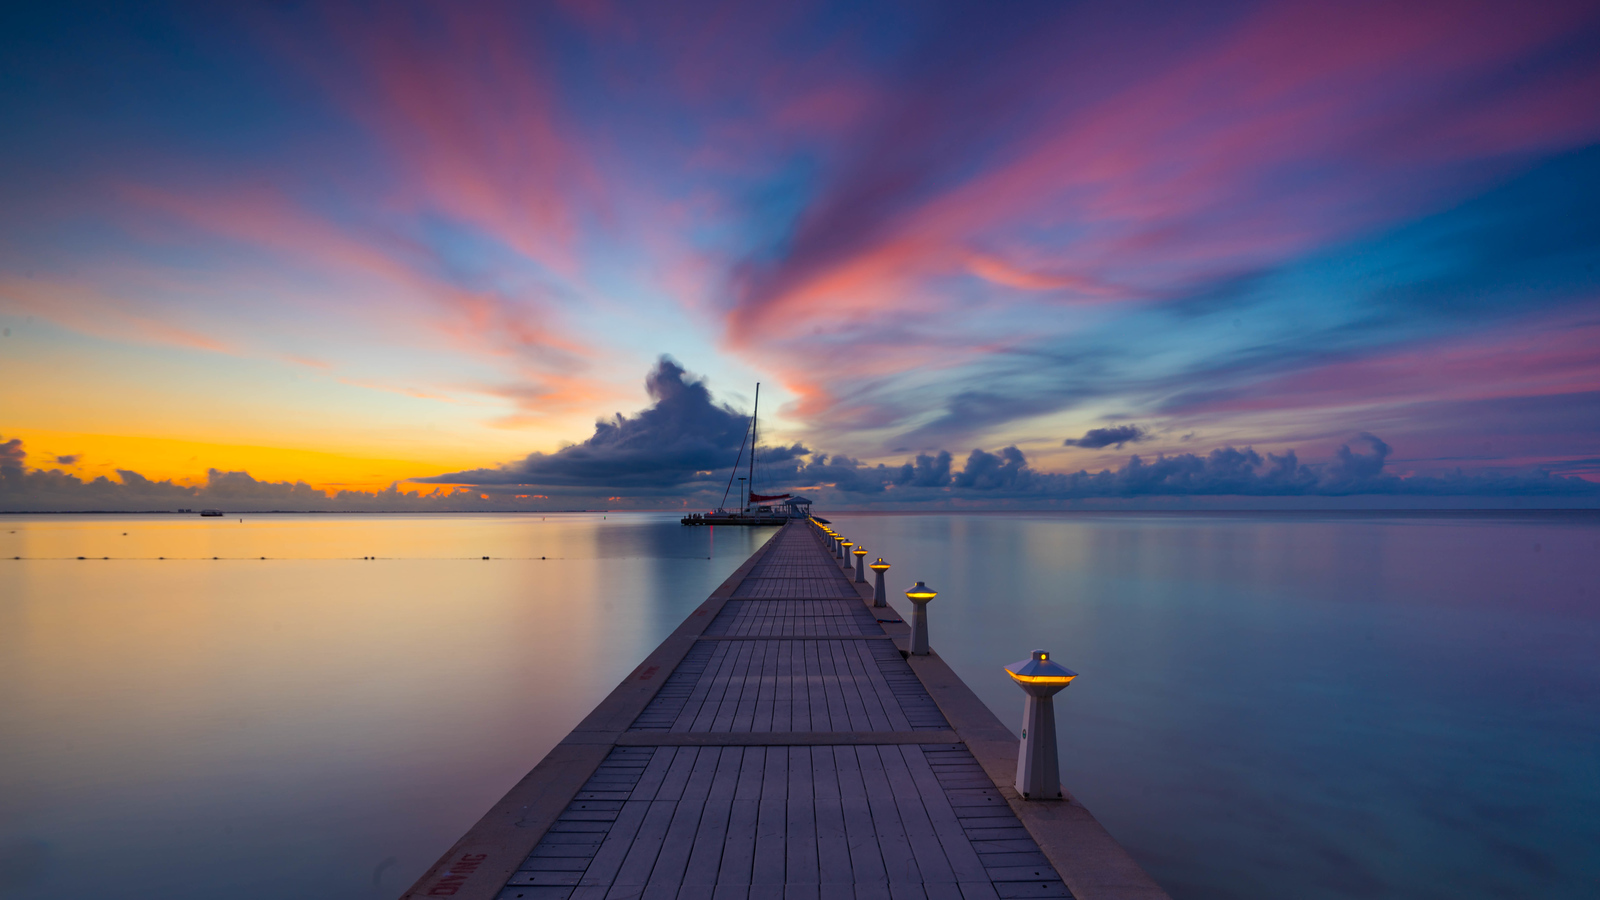 https://photos.smugmug.com/Caribbean/Cayman-Islands/i-HFCfvDL/0/X3/cayman-islands-6-X3.jpg